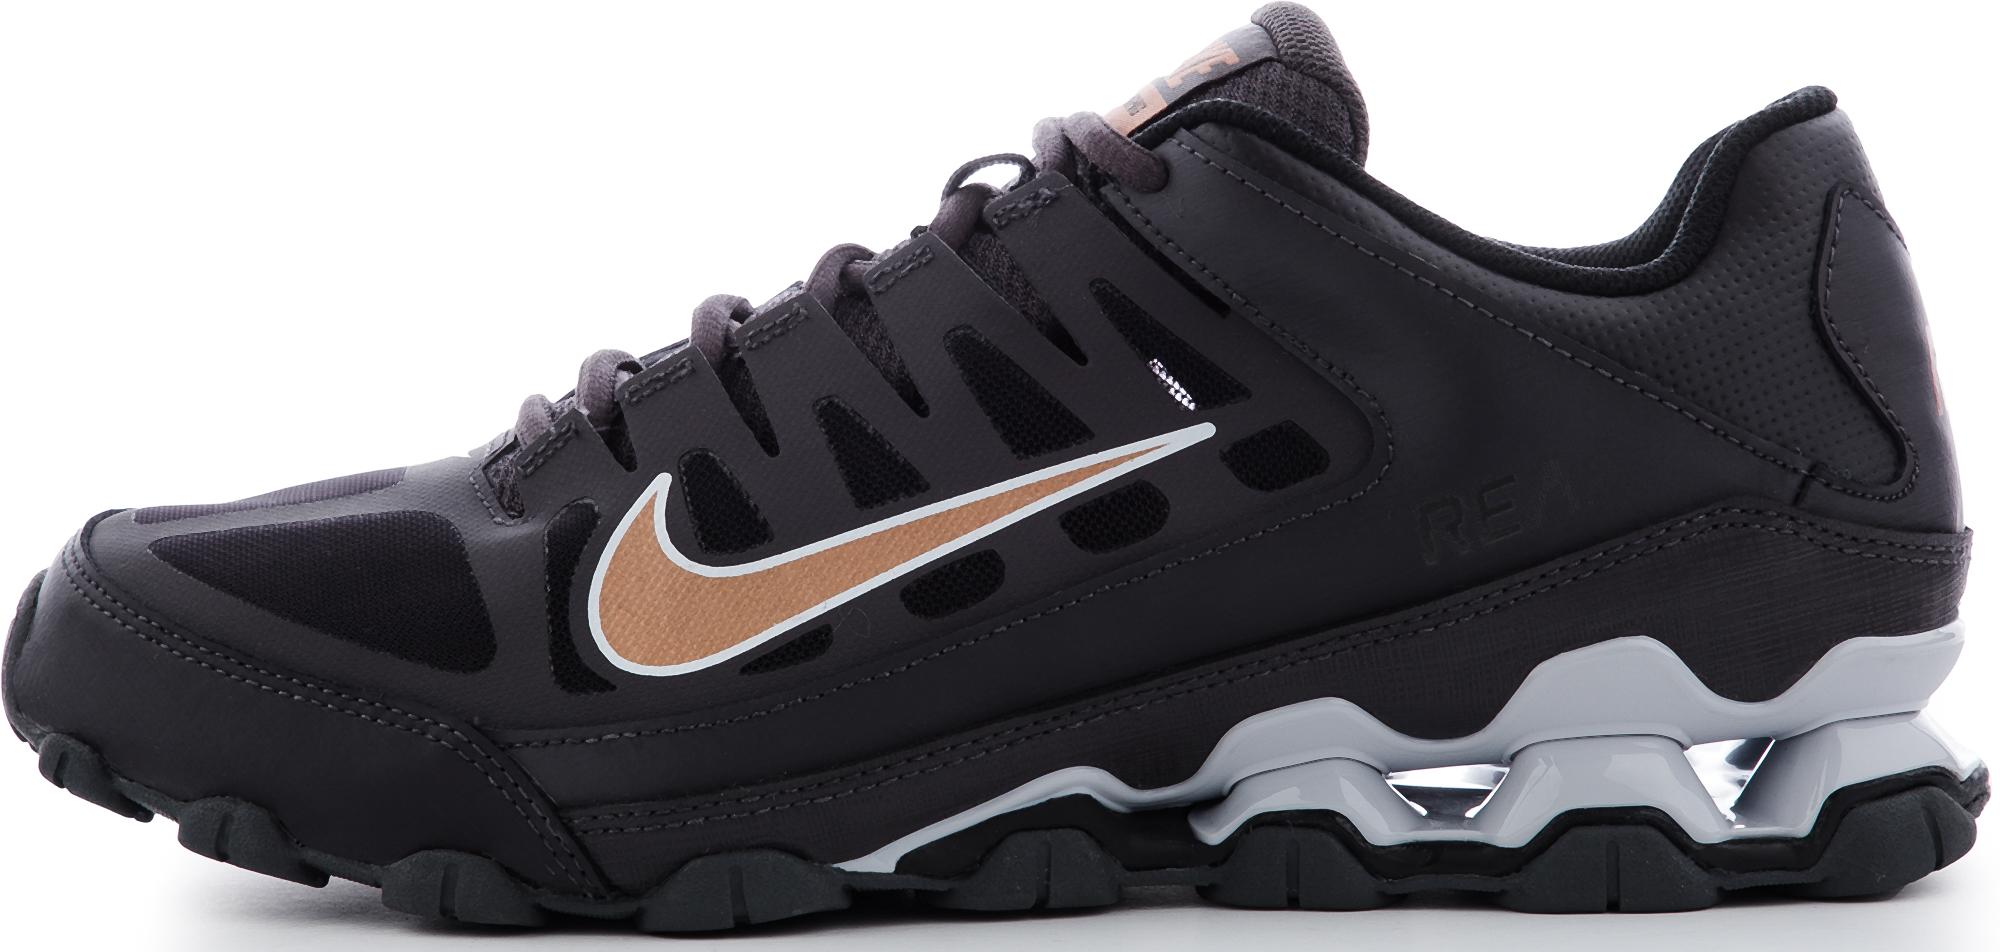 Nike Кроссовки мужские Reax 8 Tr, размер 45